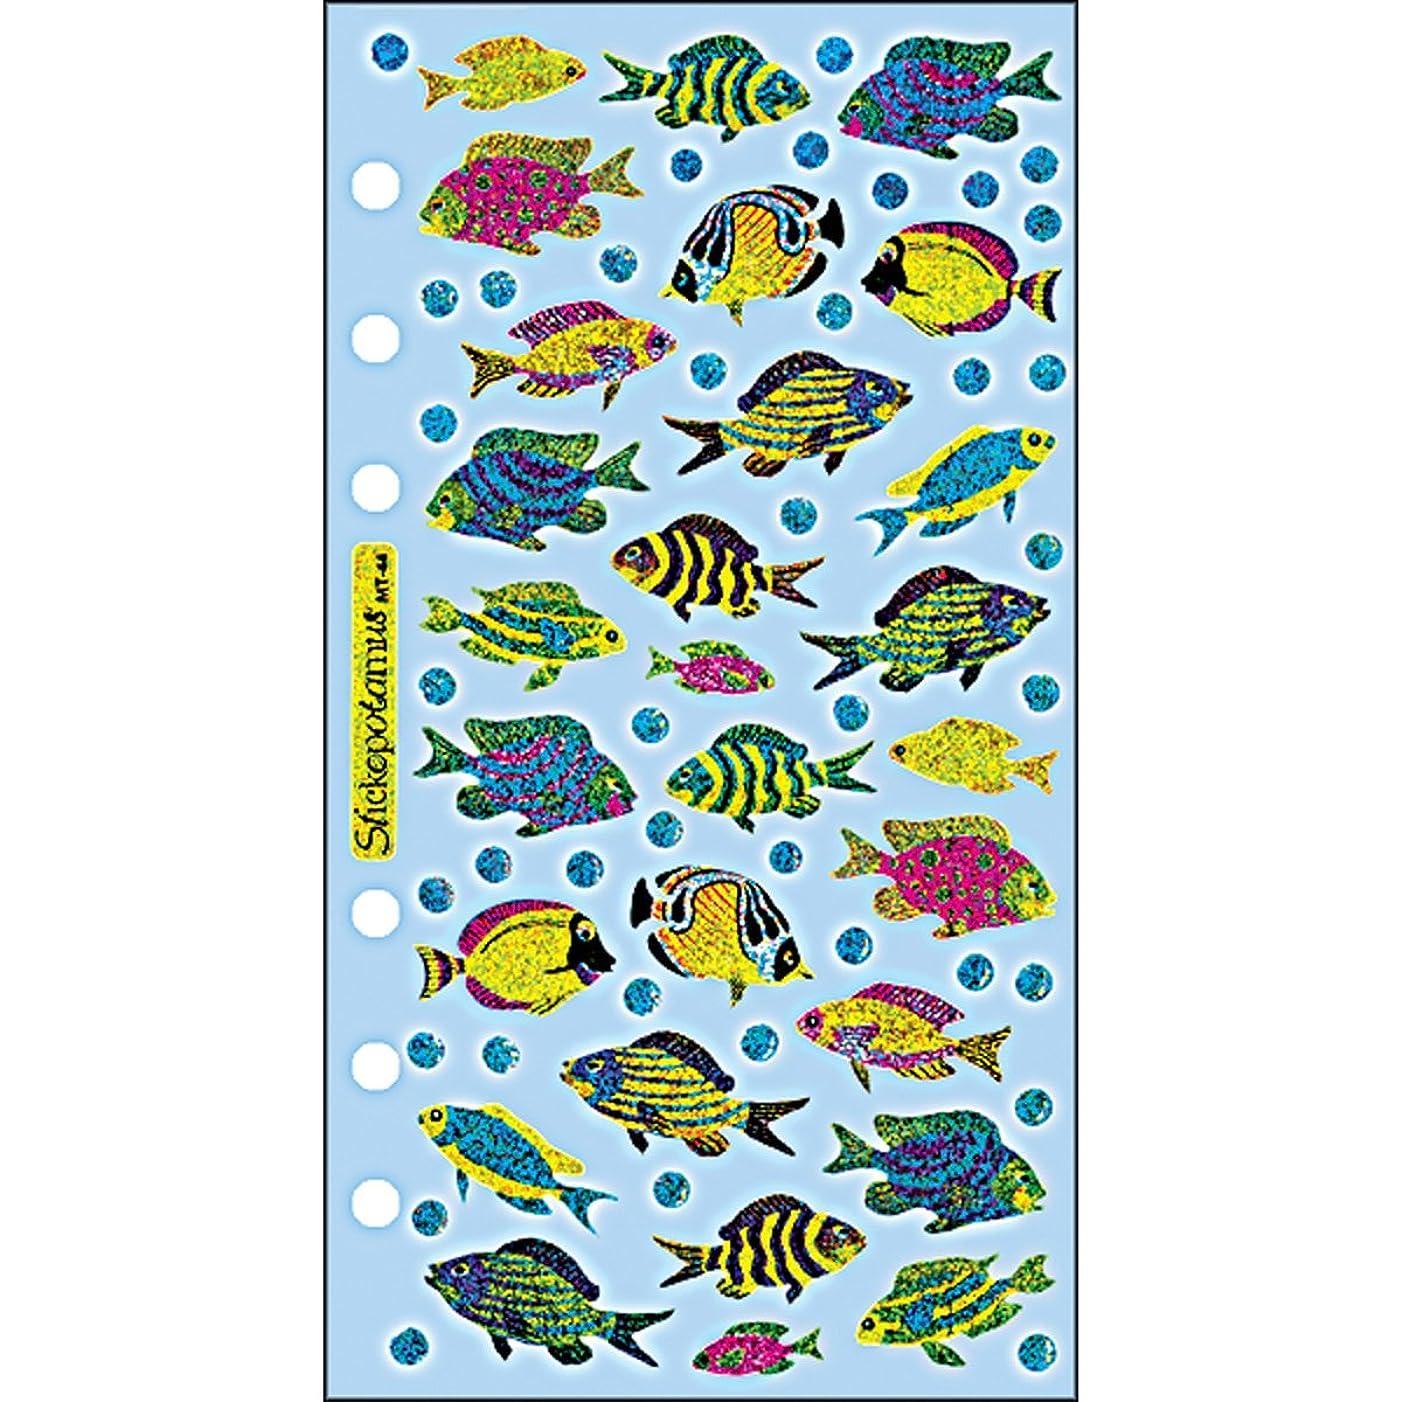 Sticko SPMT44 Classic Stickers, Funky Fish